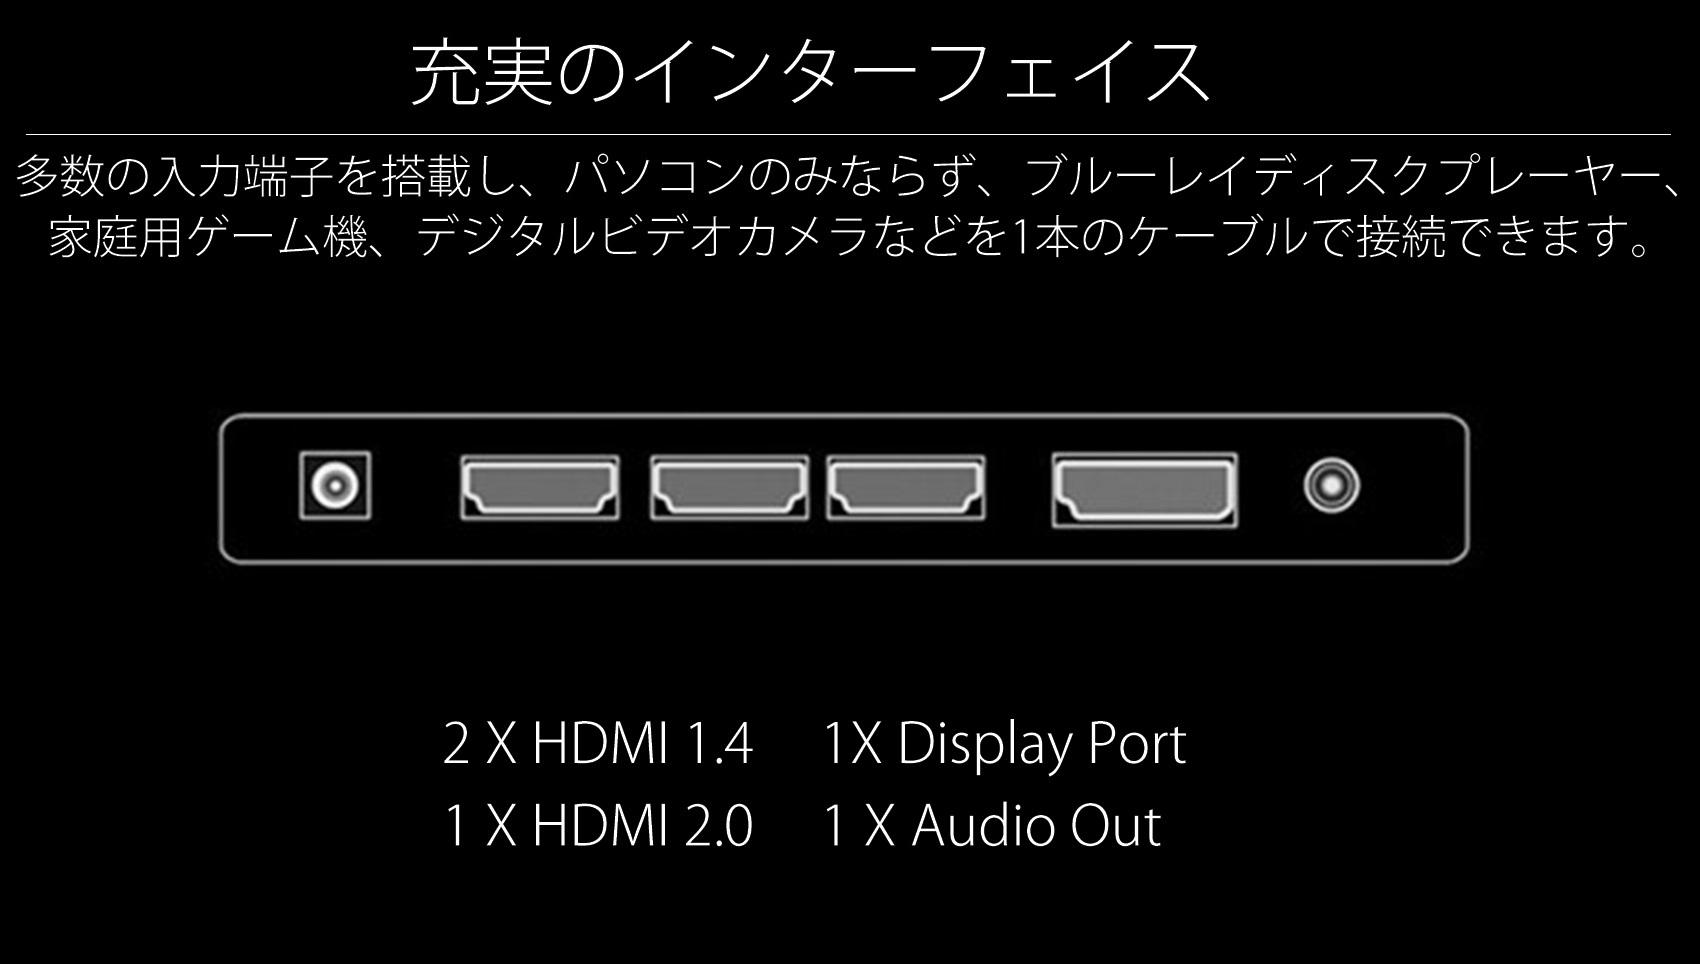 HDMI インターフェース 2560×1440ドット表示に対応する機能付HDMI入力端子(HDCP対応)を搭載し、パソコンのみならず、ブルーレイディスクプレイヤー、家庭用ゲーム機、デジタルビデオカメラなどを1本のケーブルで接続できます。筐体カラーは、ブラックの1色となります